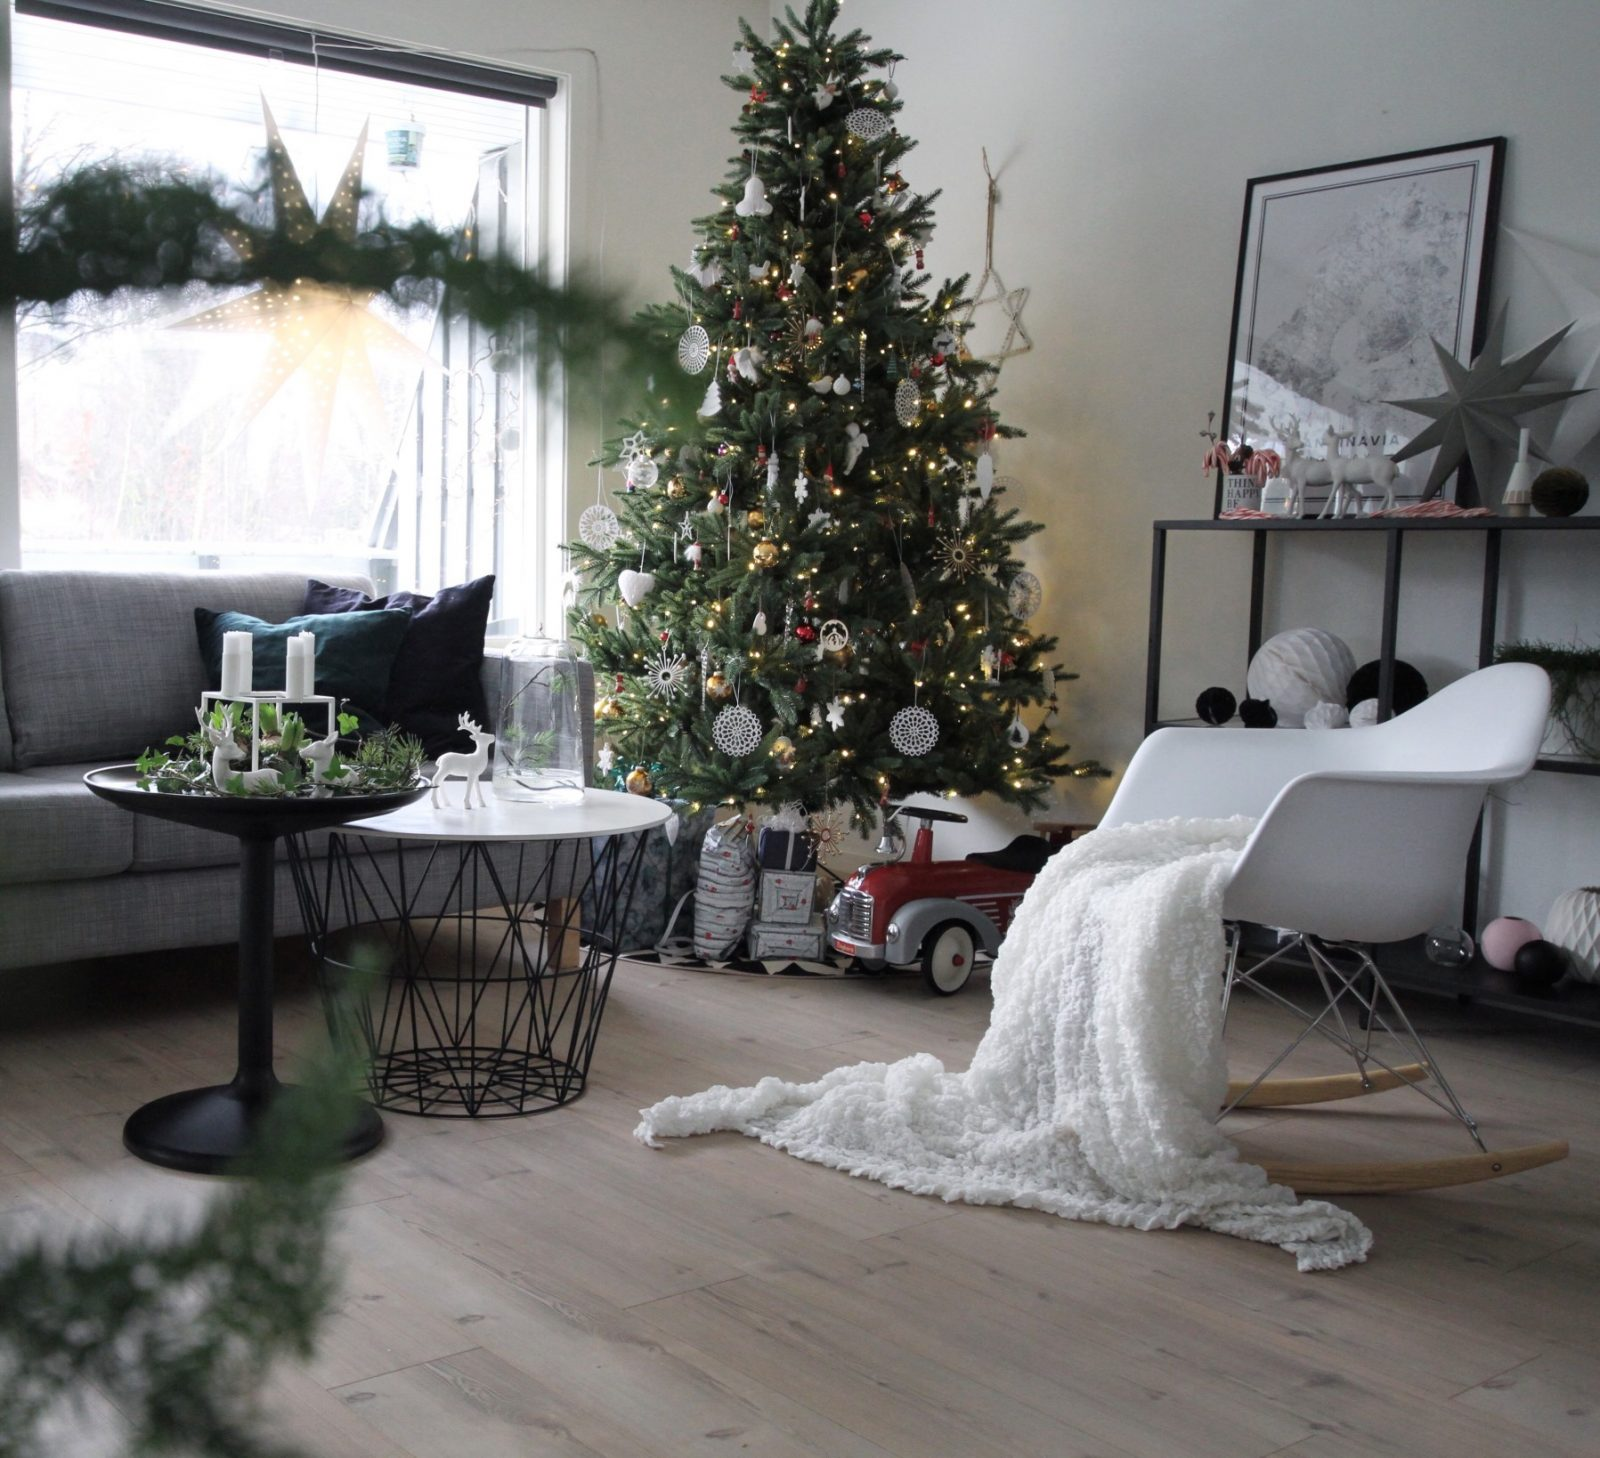 feng shui και χριστουγεννιάτικη διακόσμηση